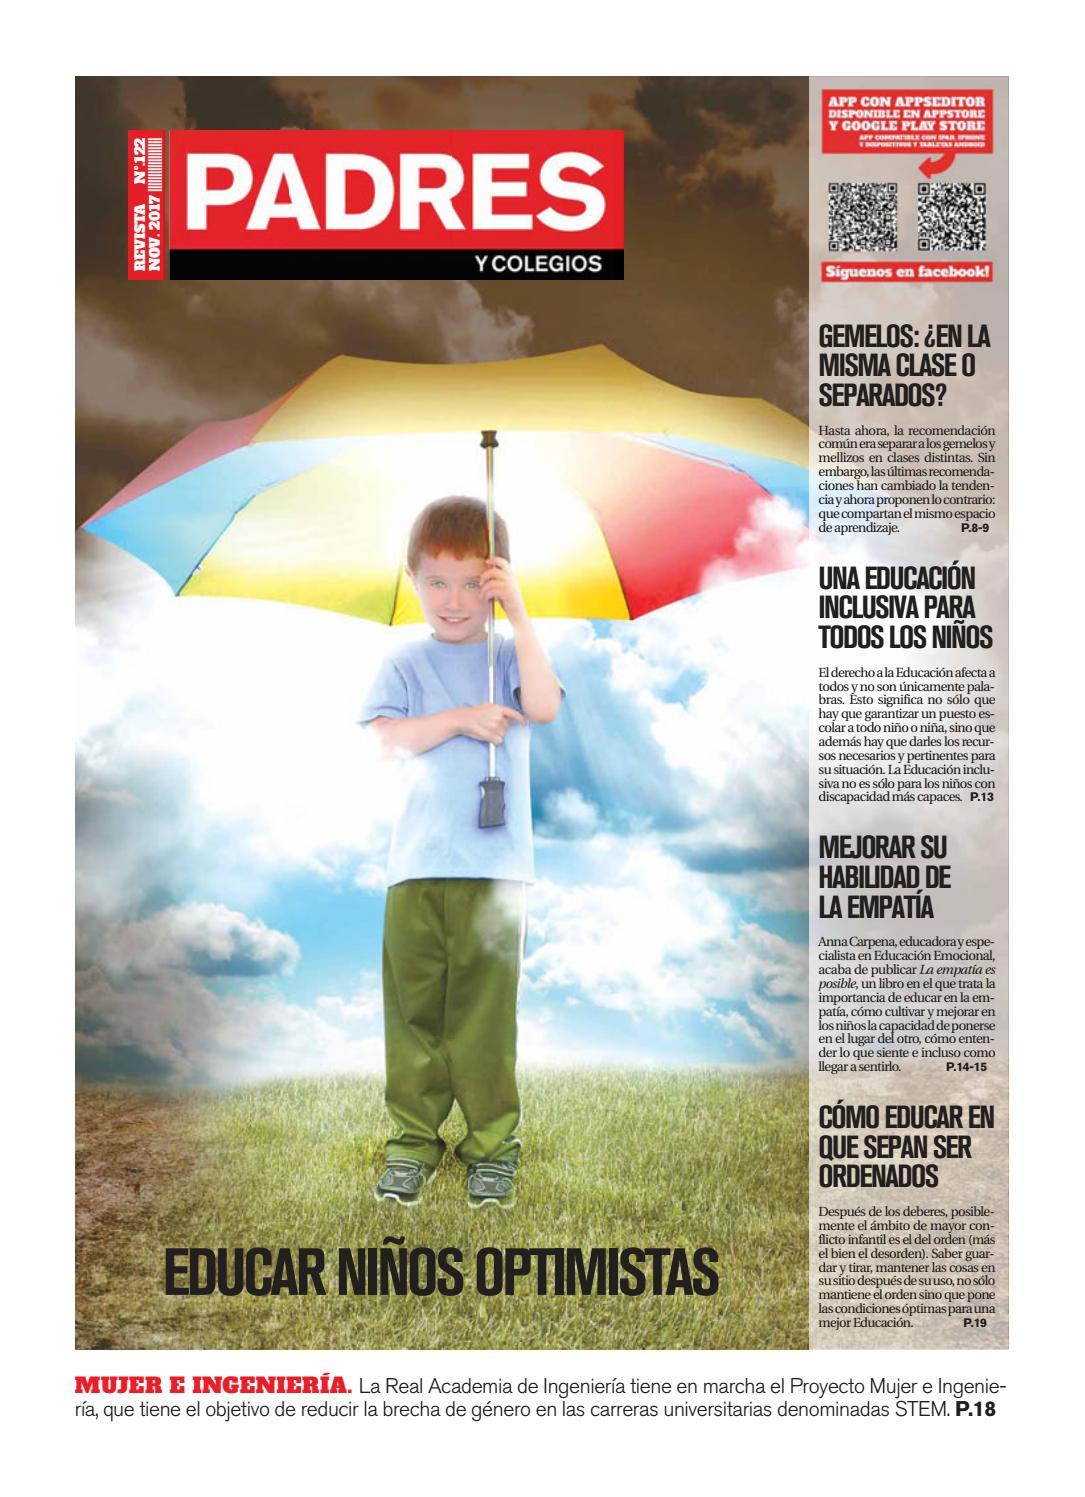 Padres y Colegios Nº 122 - noviembre 2017 by Grupo Siena - issuu